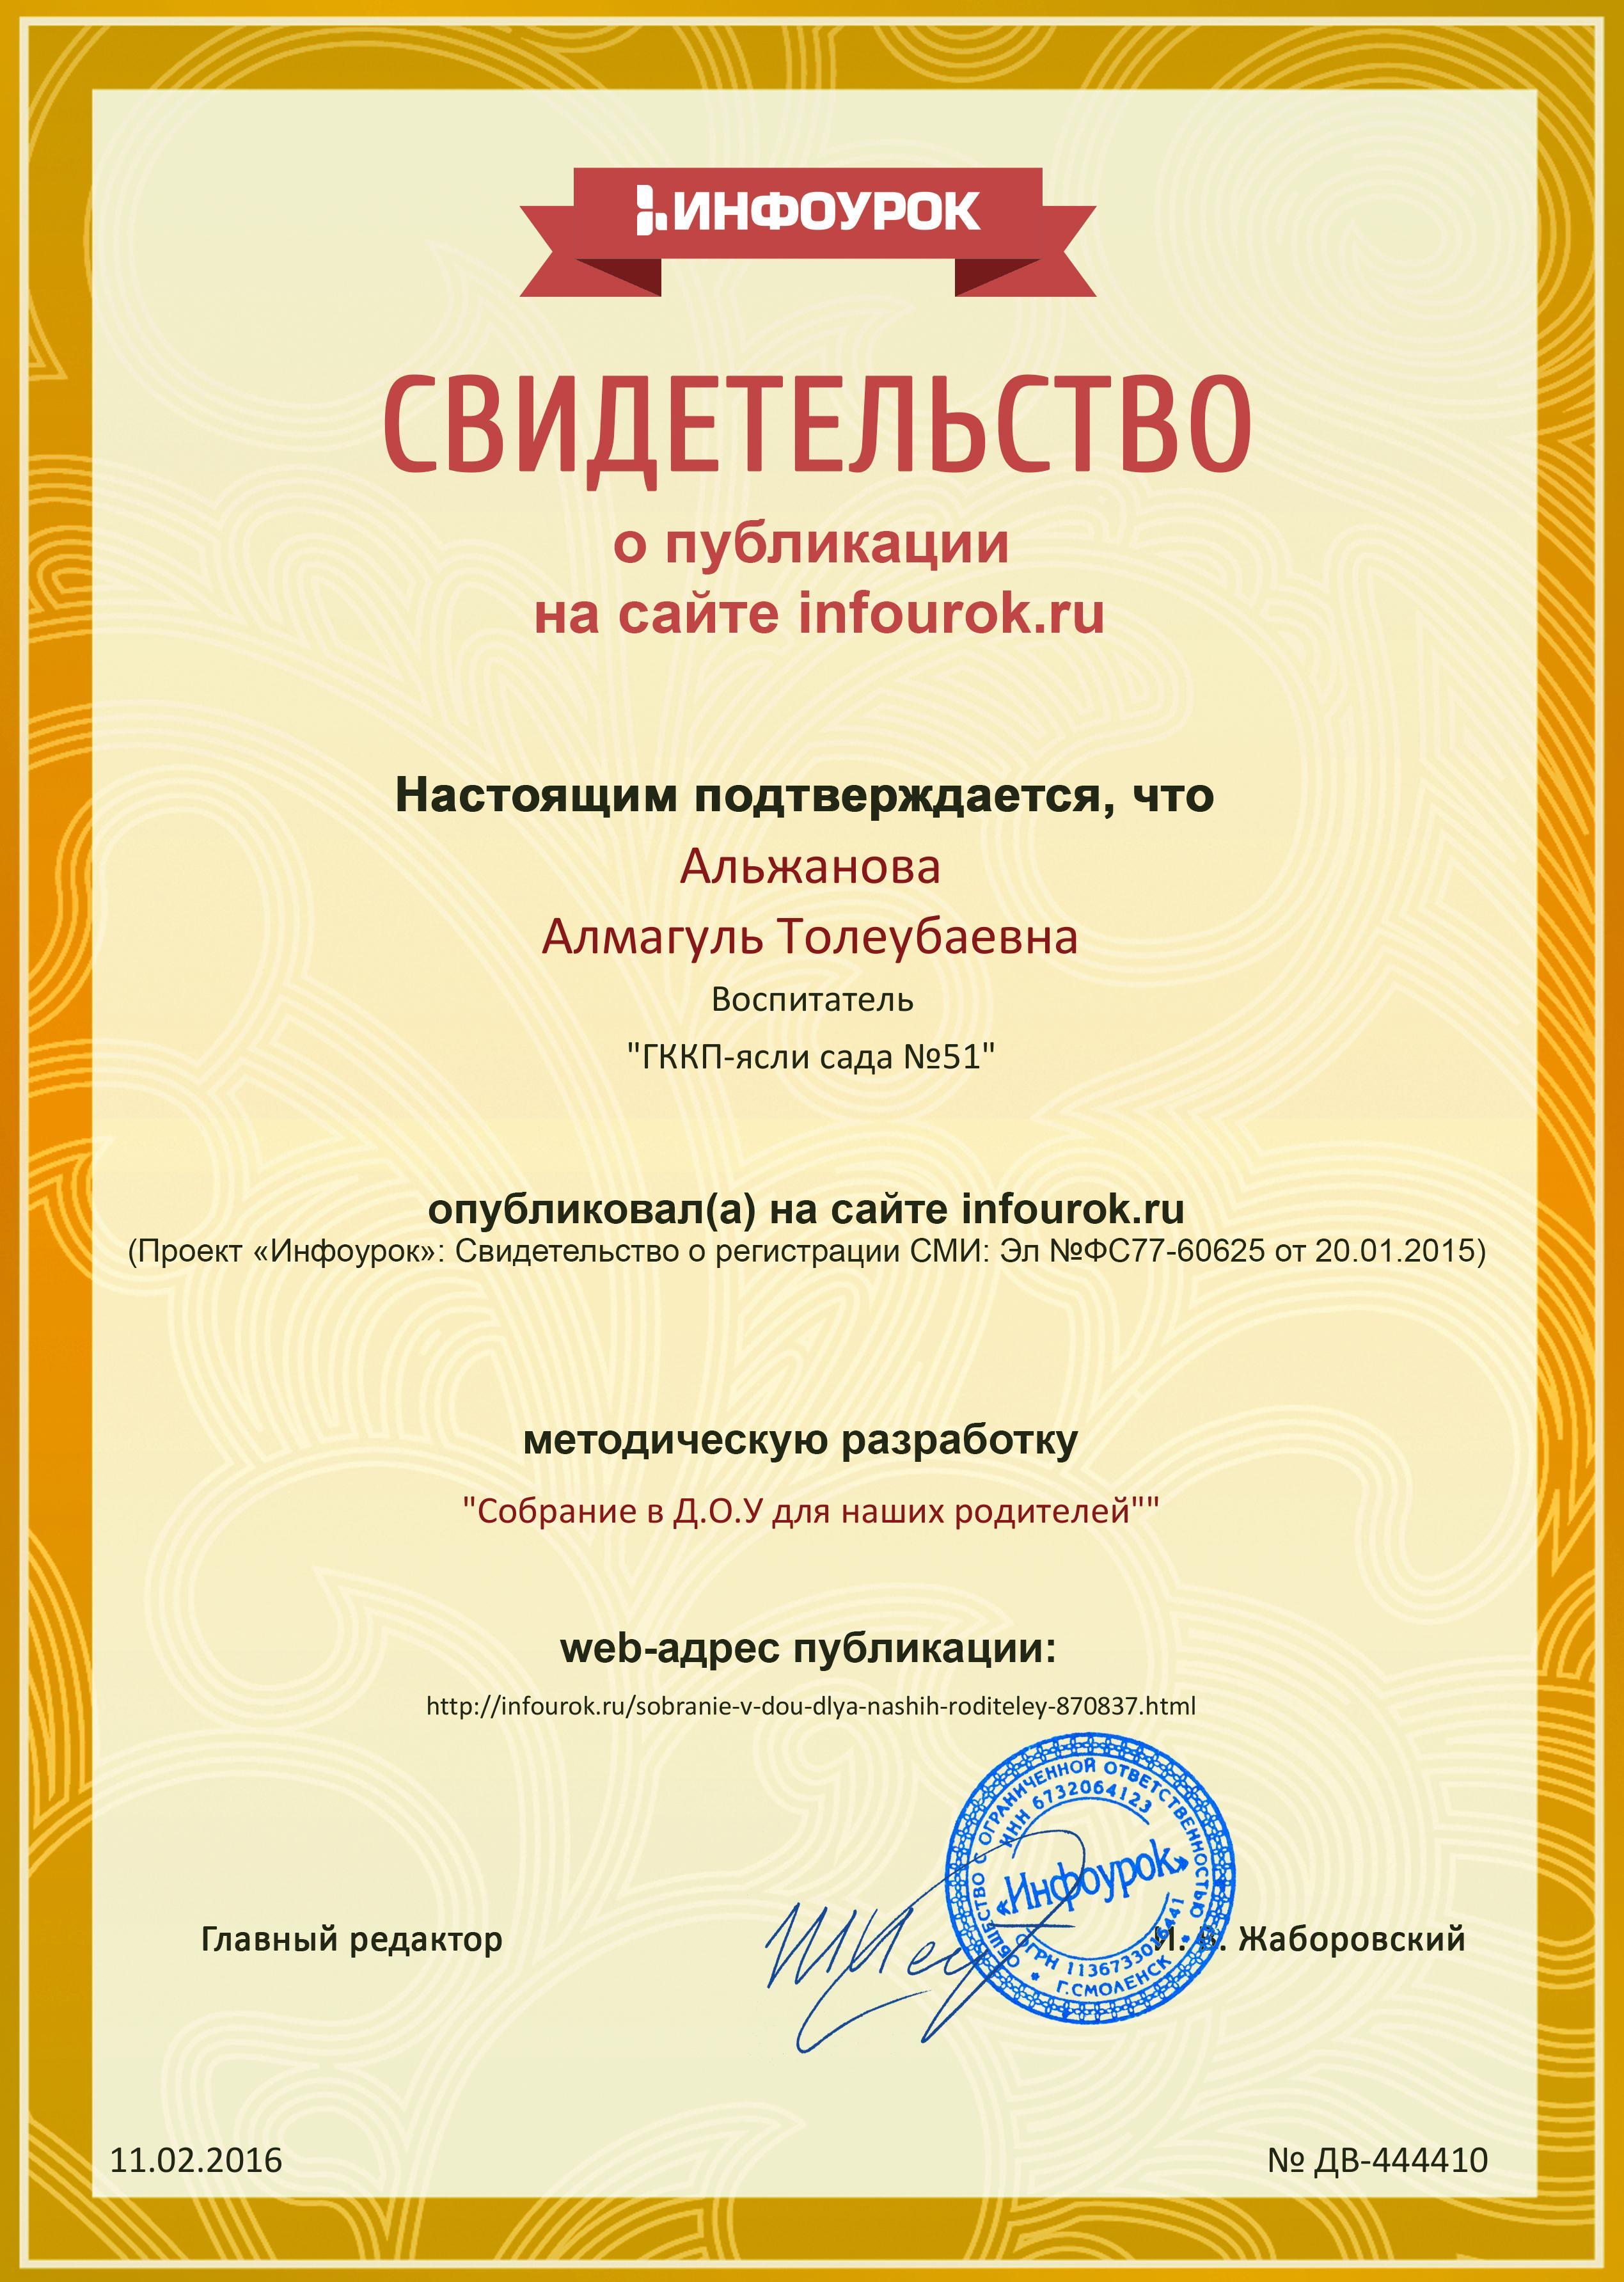 C:\Users\Sagadat-ПК\Downloads\Сертификат проекта infourok.ru № ДВ-444410 (2).jpg